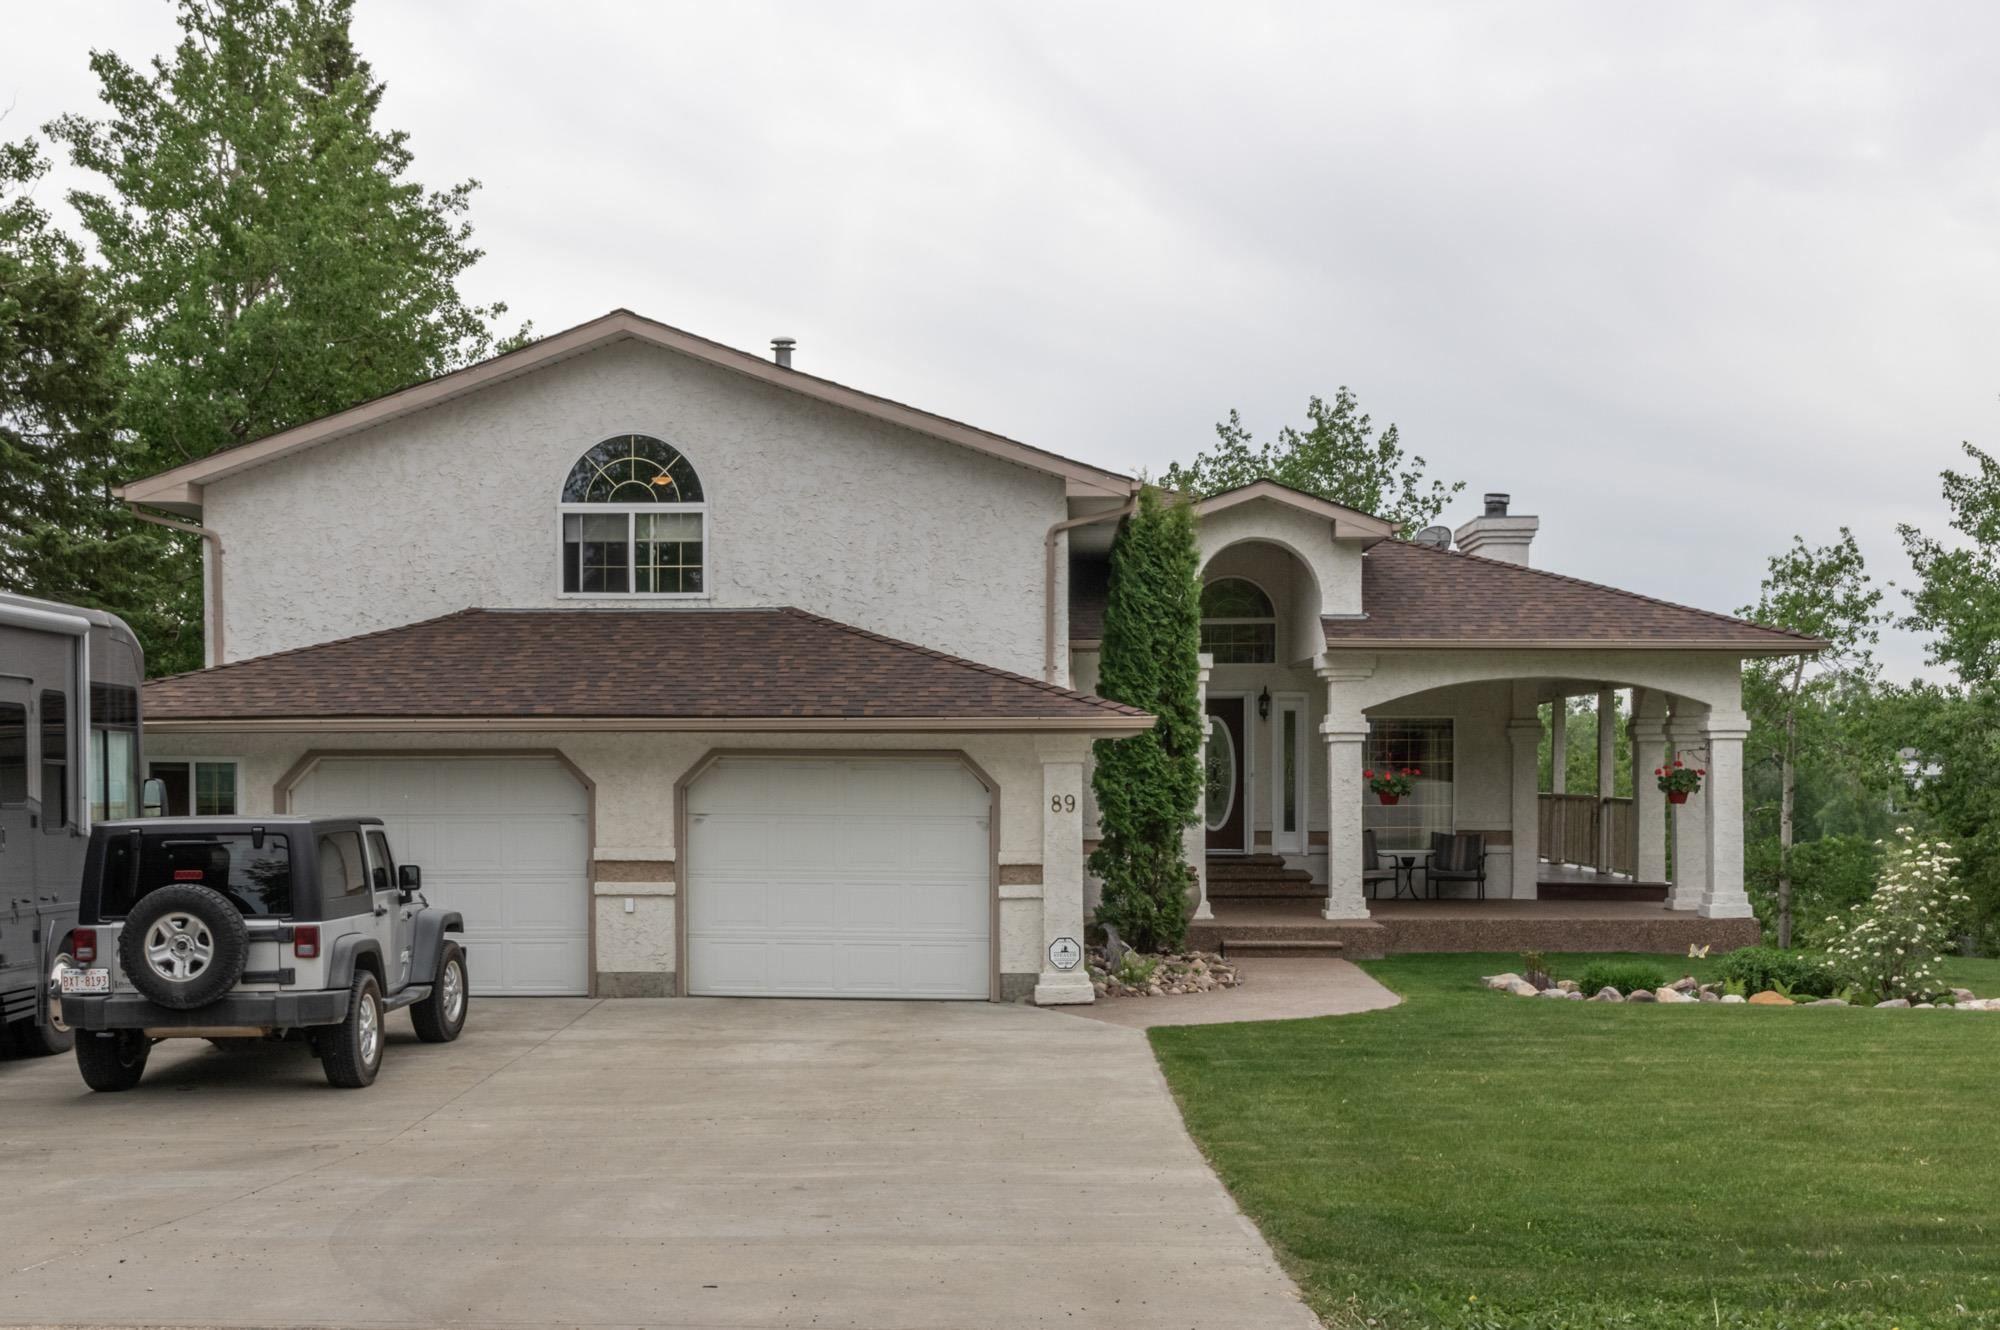 Main Photo: 89 52059 RR 220: Rural Strathcona County Condo for sale : MLS®# E4249043